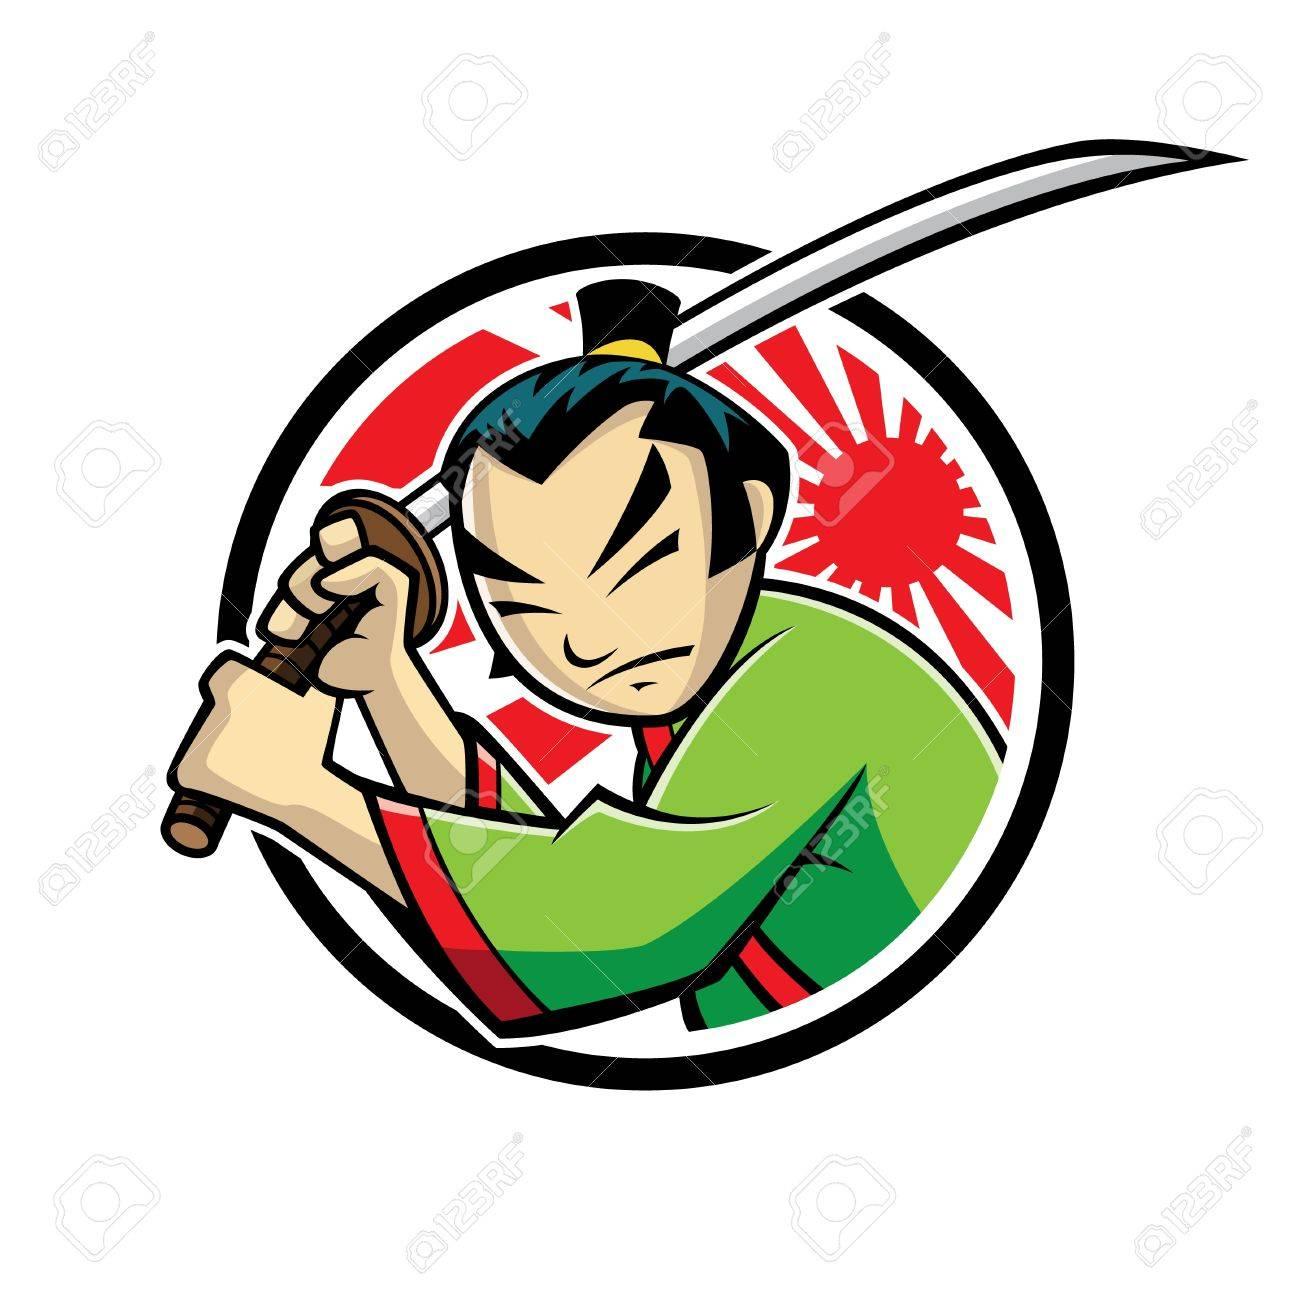 japanese samurai were swinging a samurai sword Stock Vector - 17953997